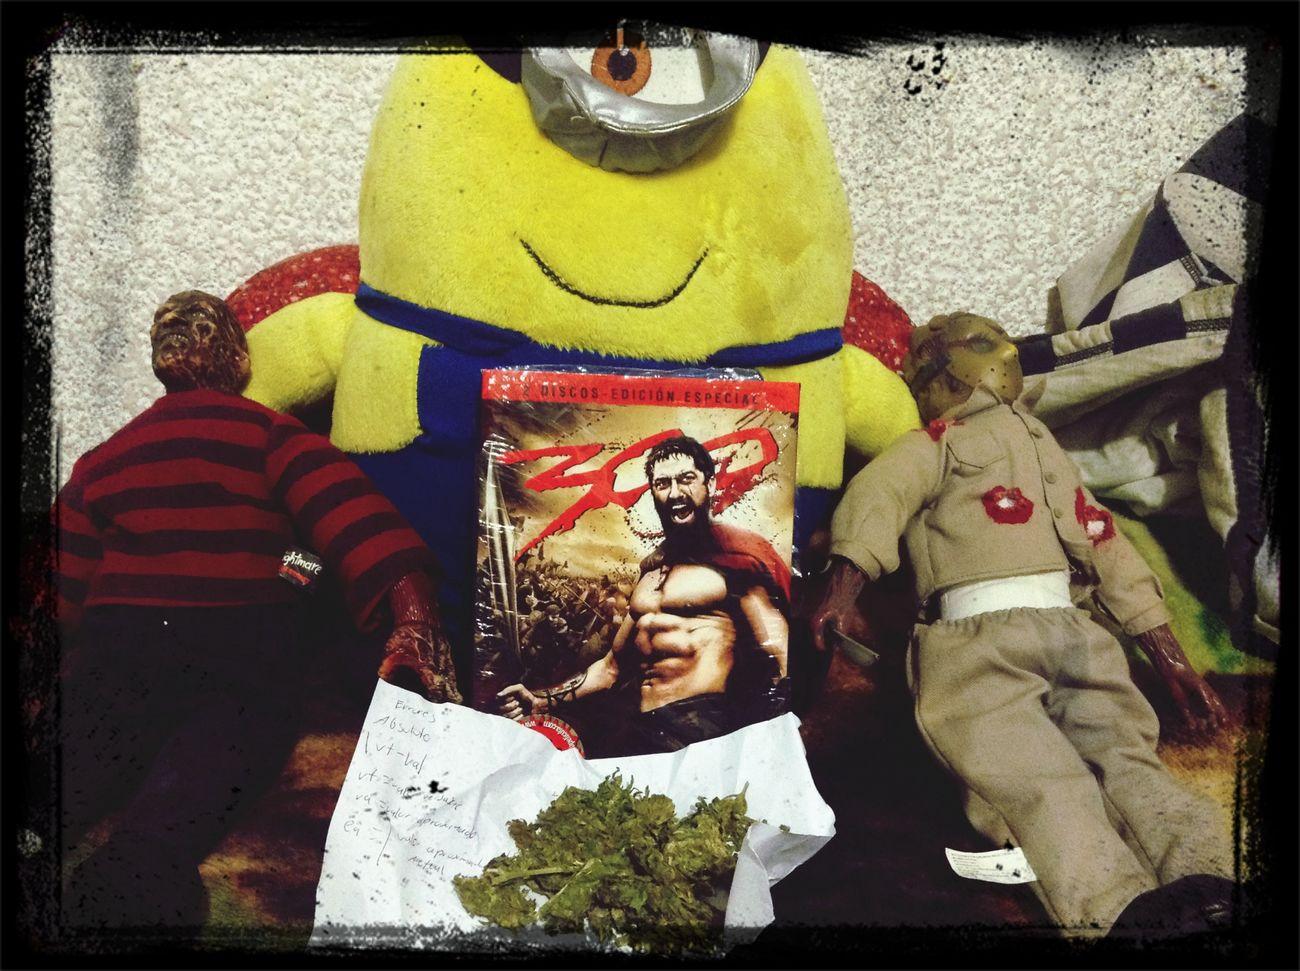 Weed Life Weed Jason Freddy Krueger